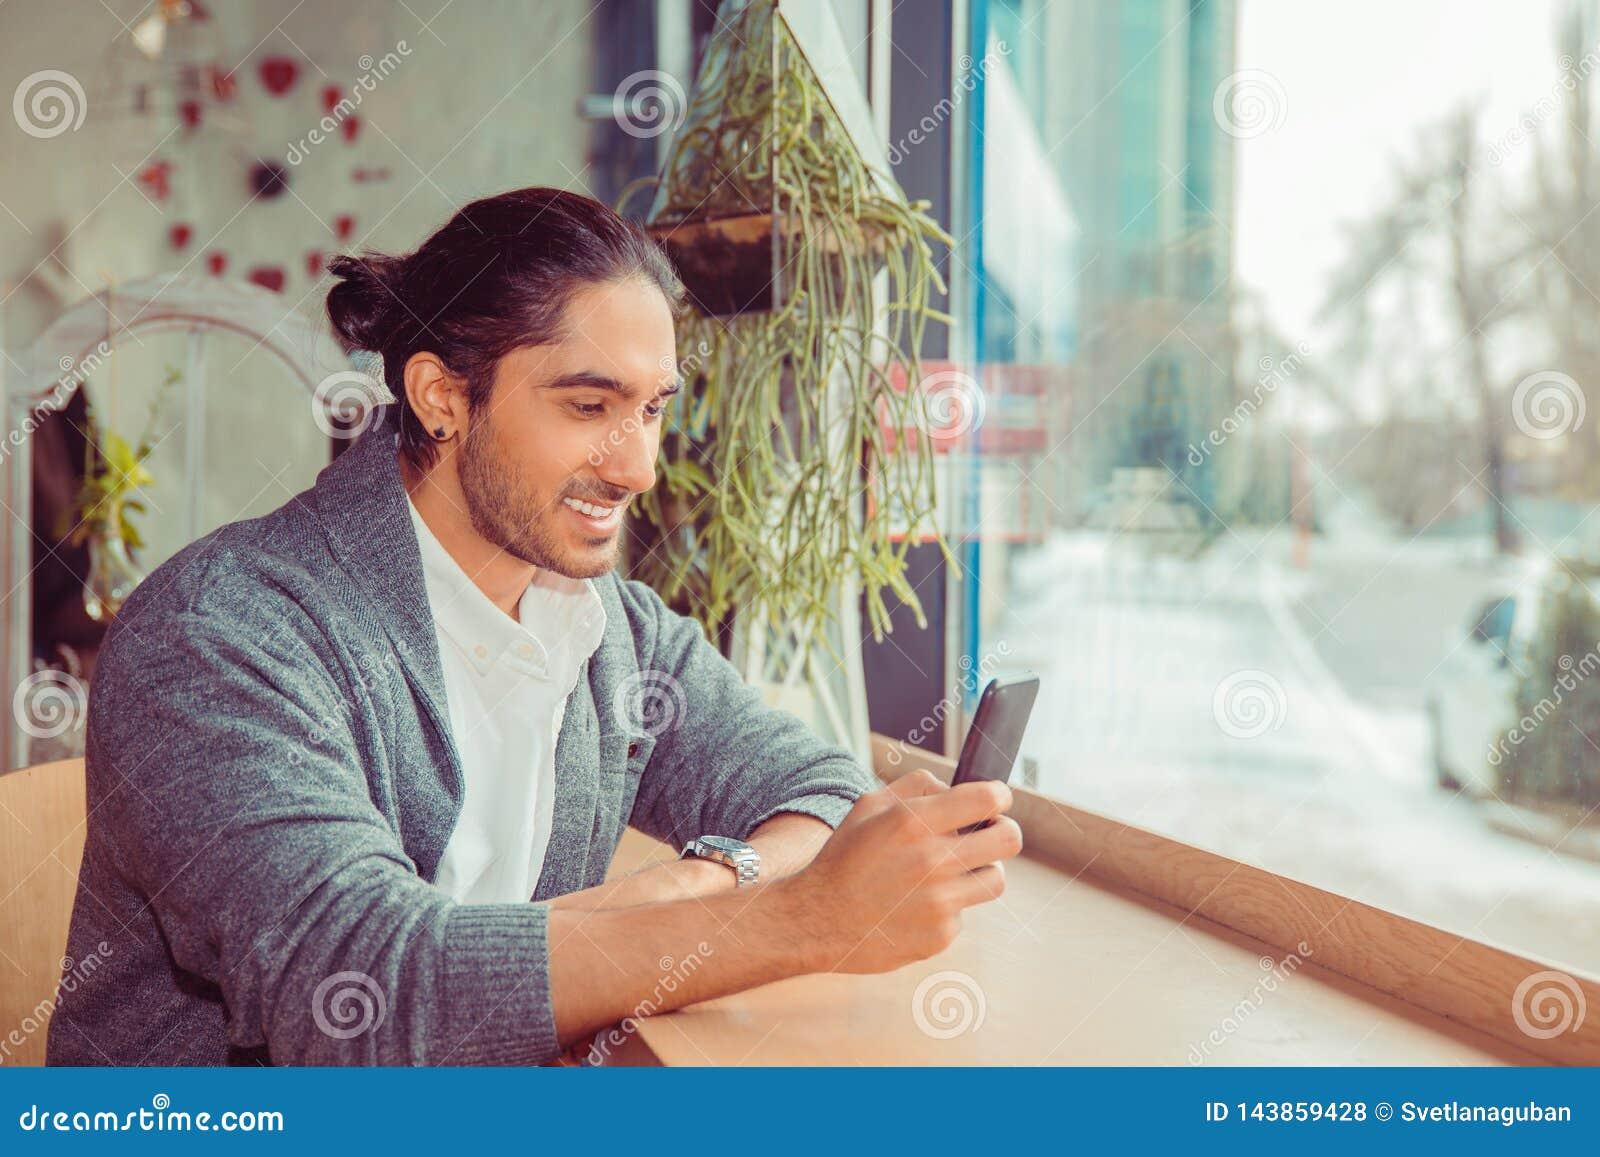 Happy man looking at phone smiling, texting